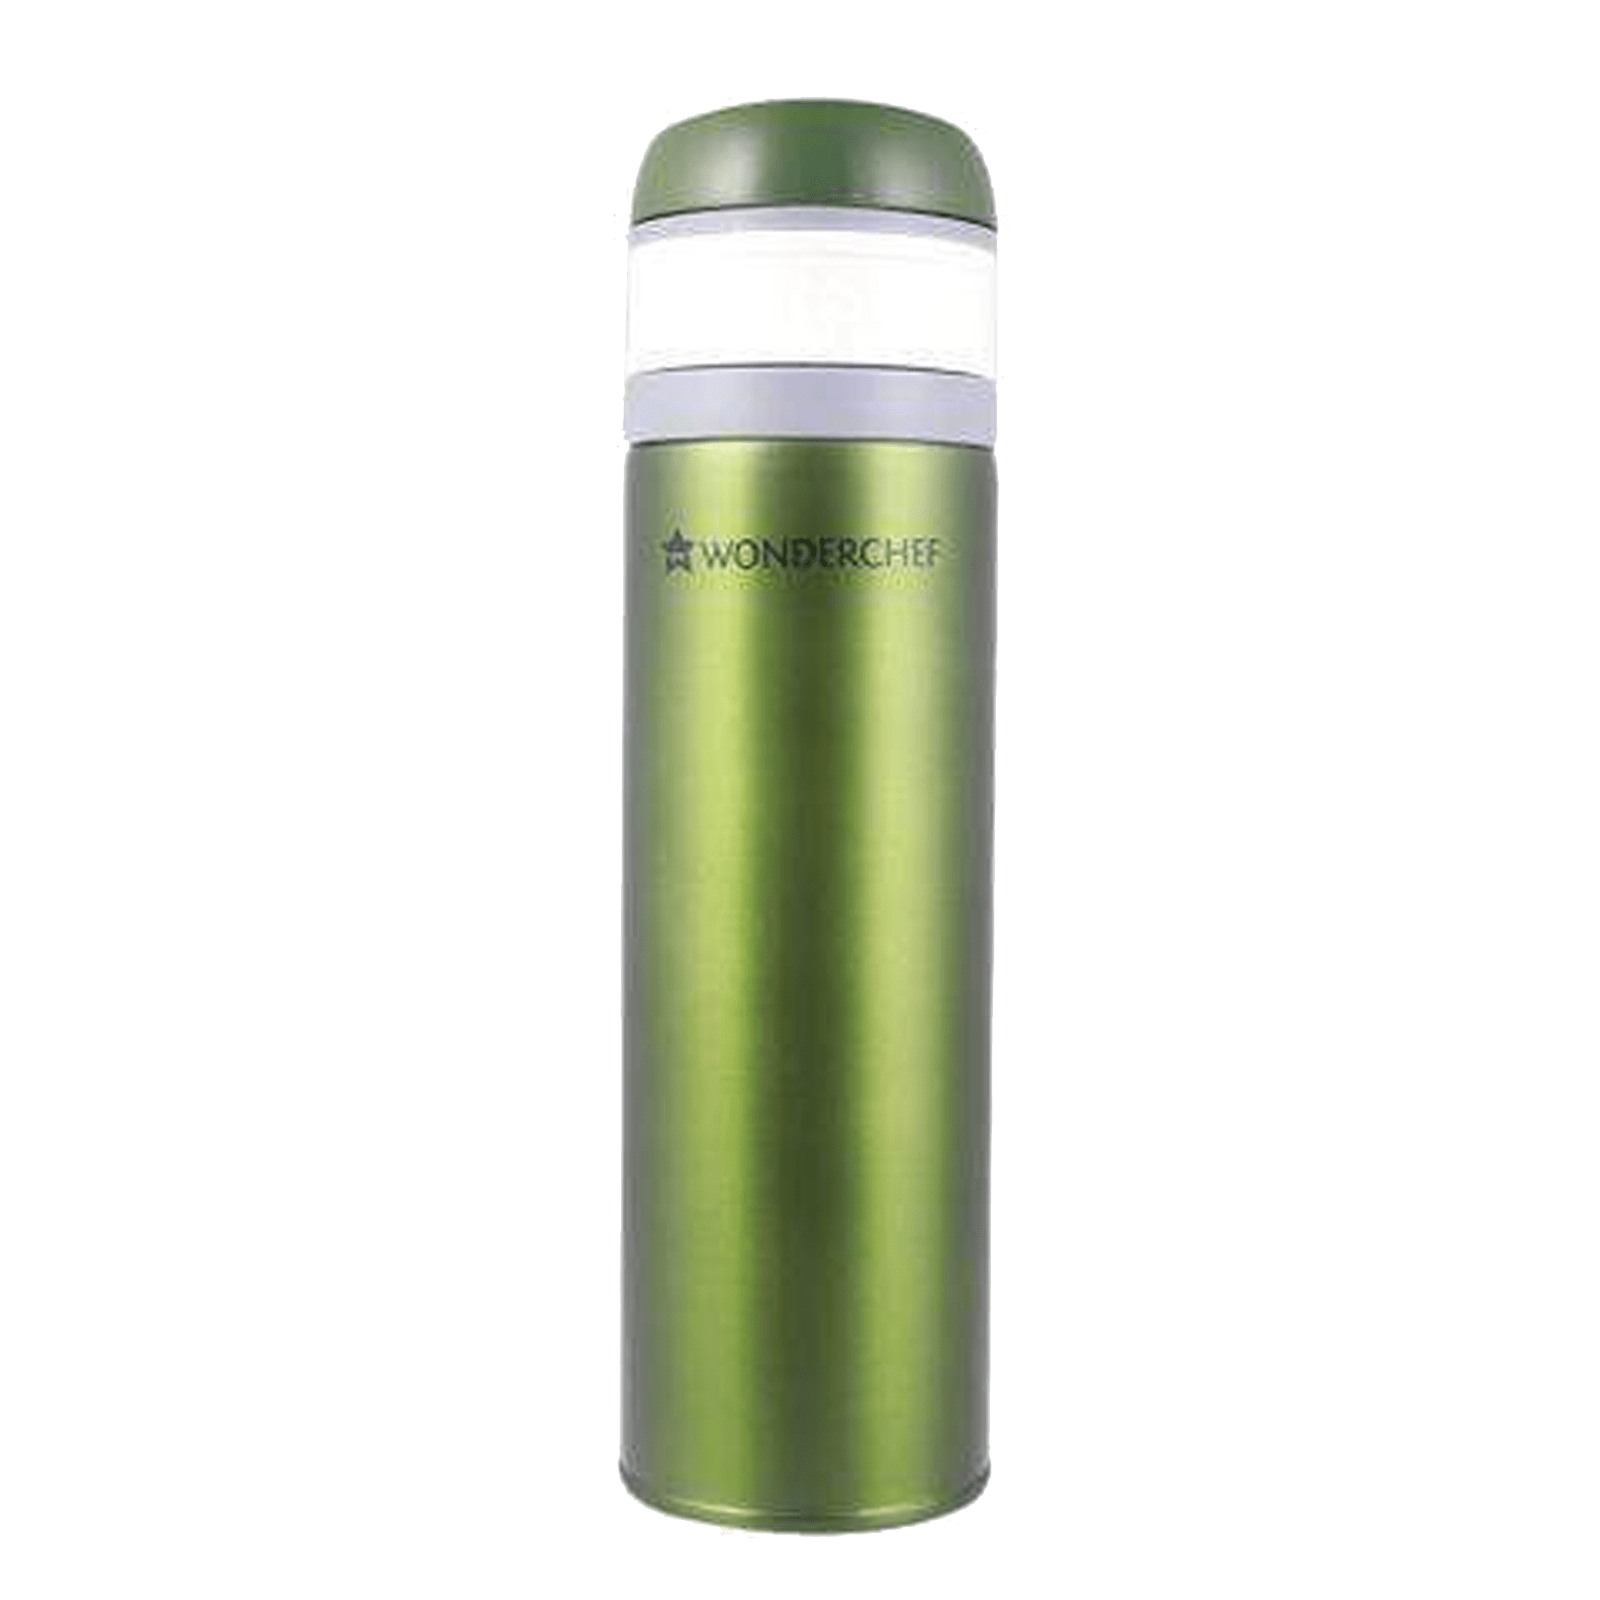 Wonderchef Uni-Bot 0.5 Litres Stainless Steel Water Bottle (Vacuum Insulation, 63152878, Olive Green)